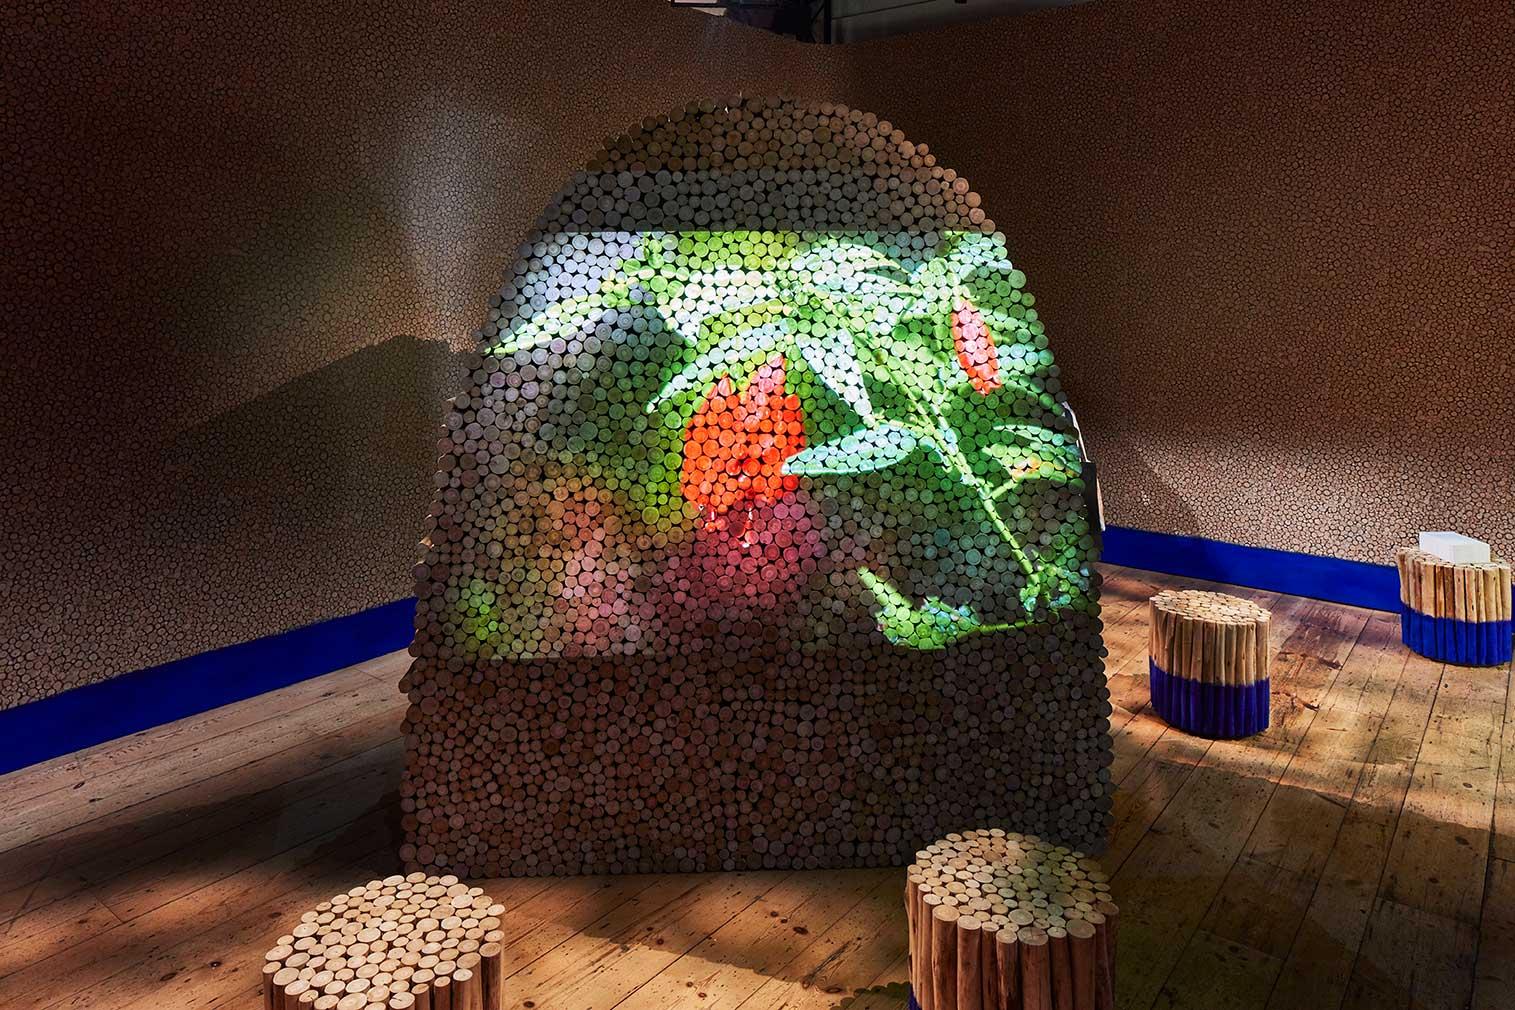 Brazil pavilion at London Design Biennale 2018